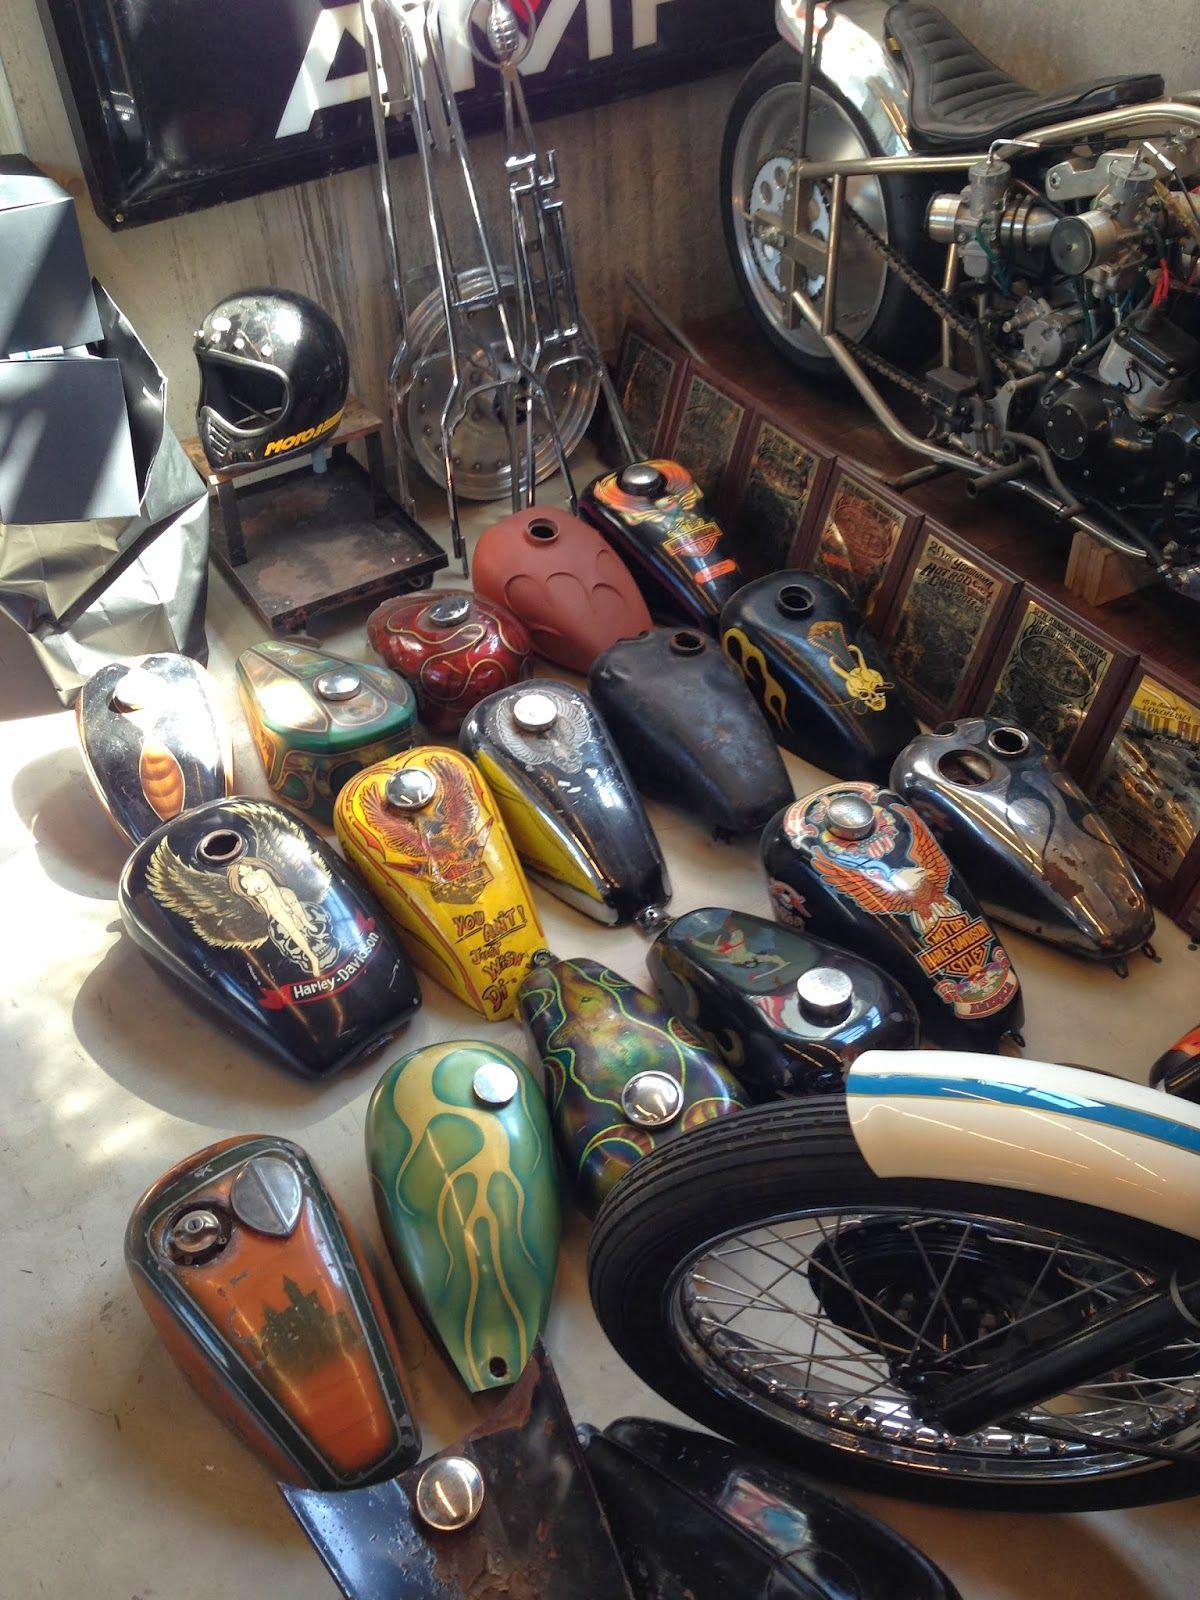 Chopper And Bobber Gas Tanks Jpg 1200 1600 Motorcycle Workshop Motorbike Tanks Gas Tank Paint